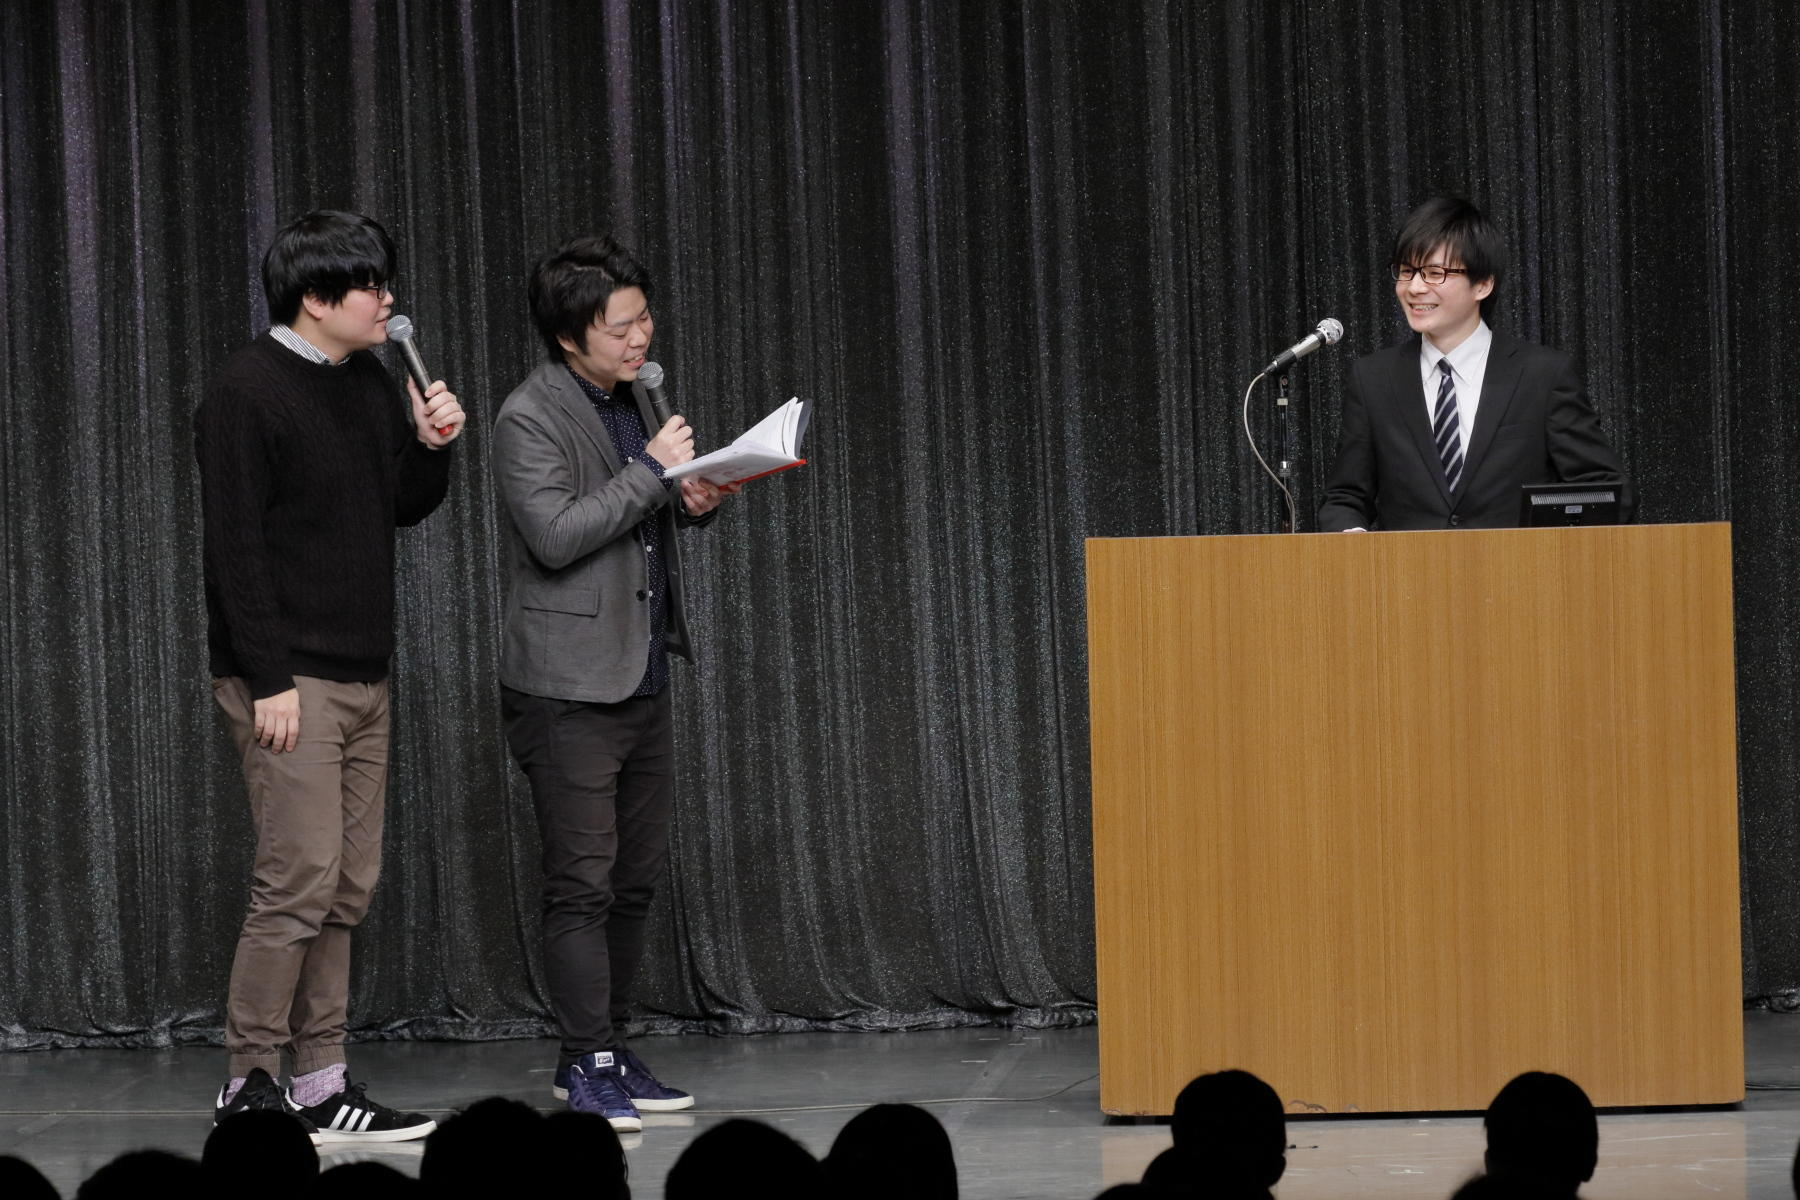 http://news.yoshimoto.co.jp/20170315170153-dd3683537a97b0e663d89eba3e50687b30019b45.jpg